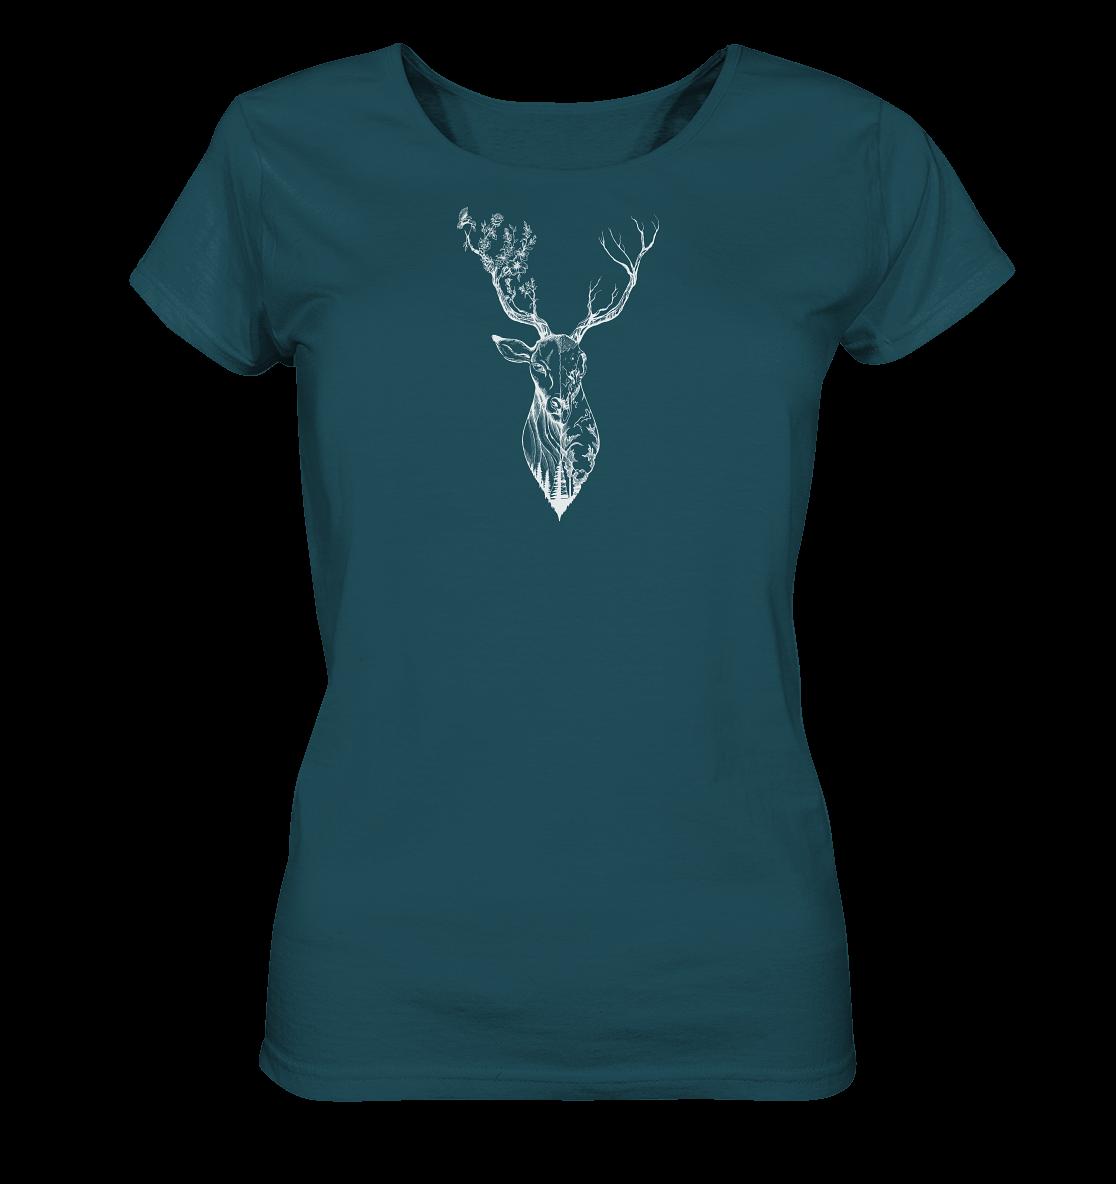 front-ladies-organic-shirt-204d59-1116x-7.png